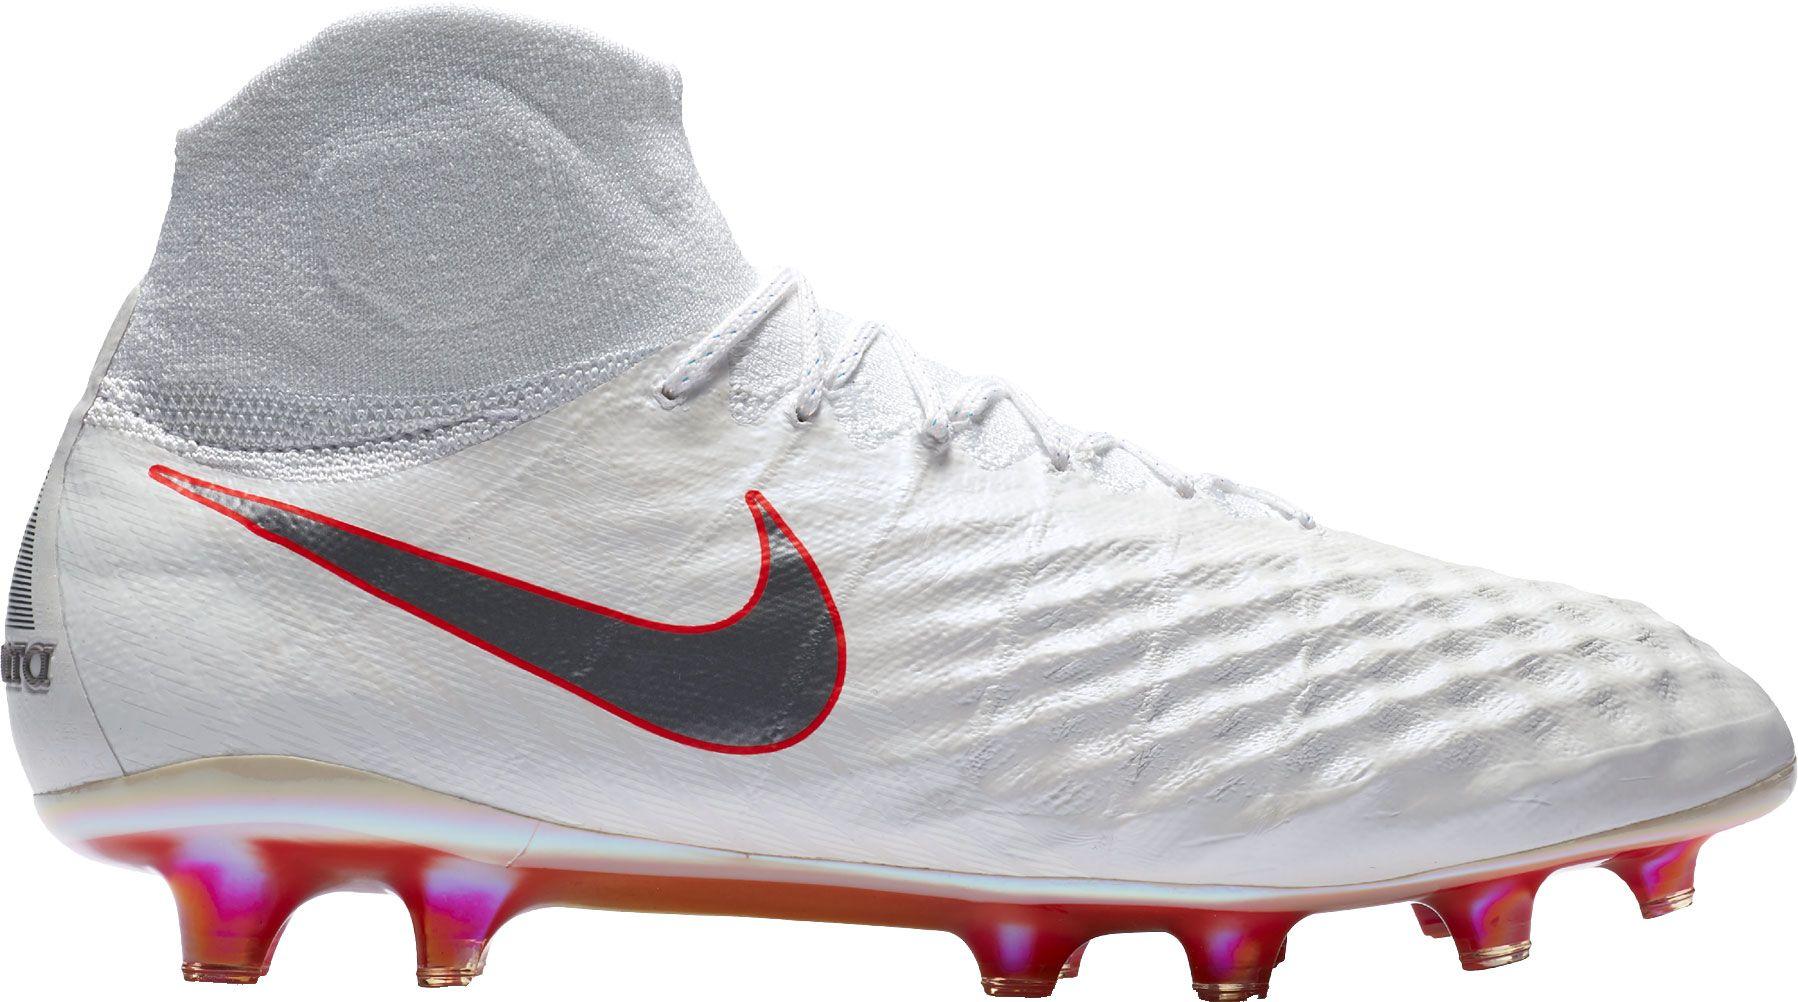 Nike Magista Obra II Elite FG Soccer Cleats, Men's, Size: 8.0, White